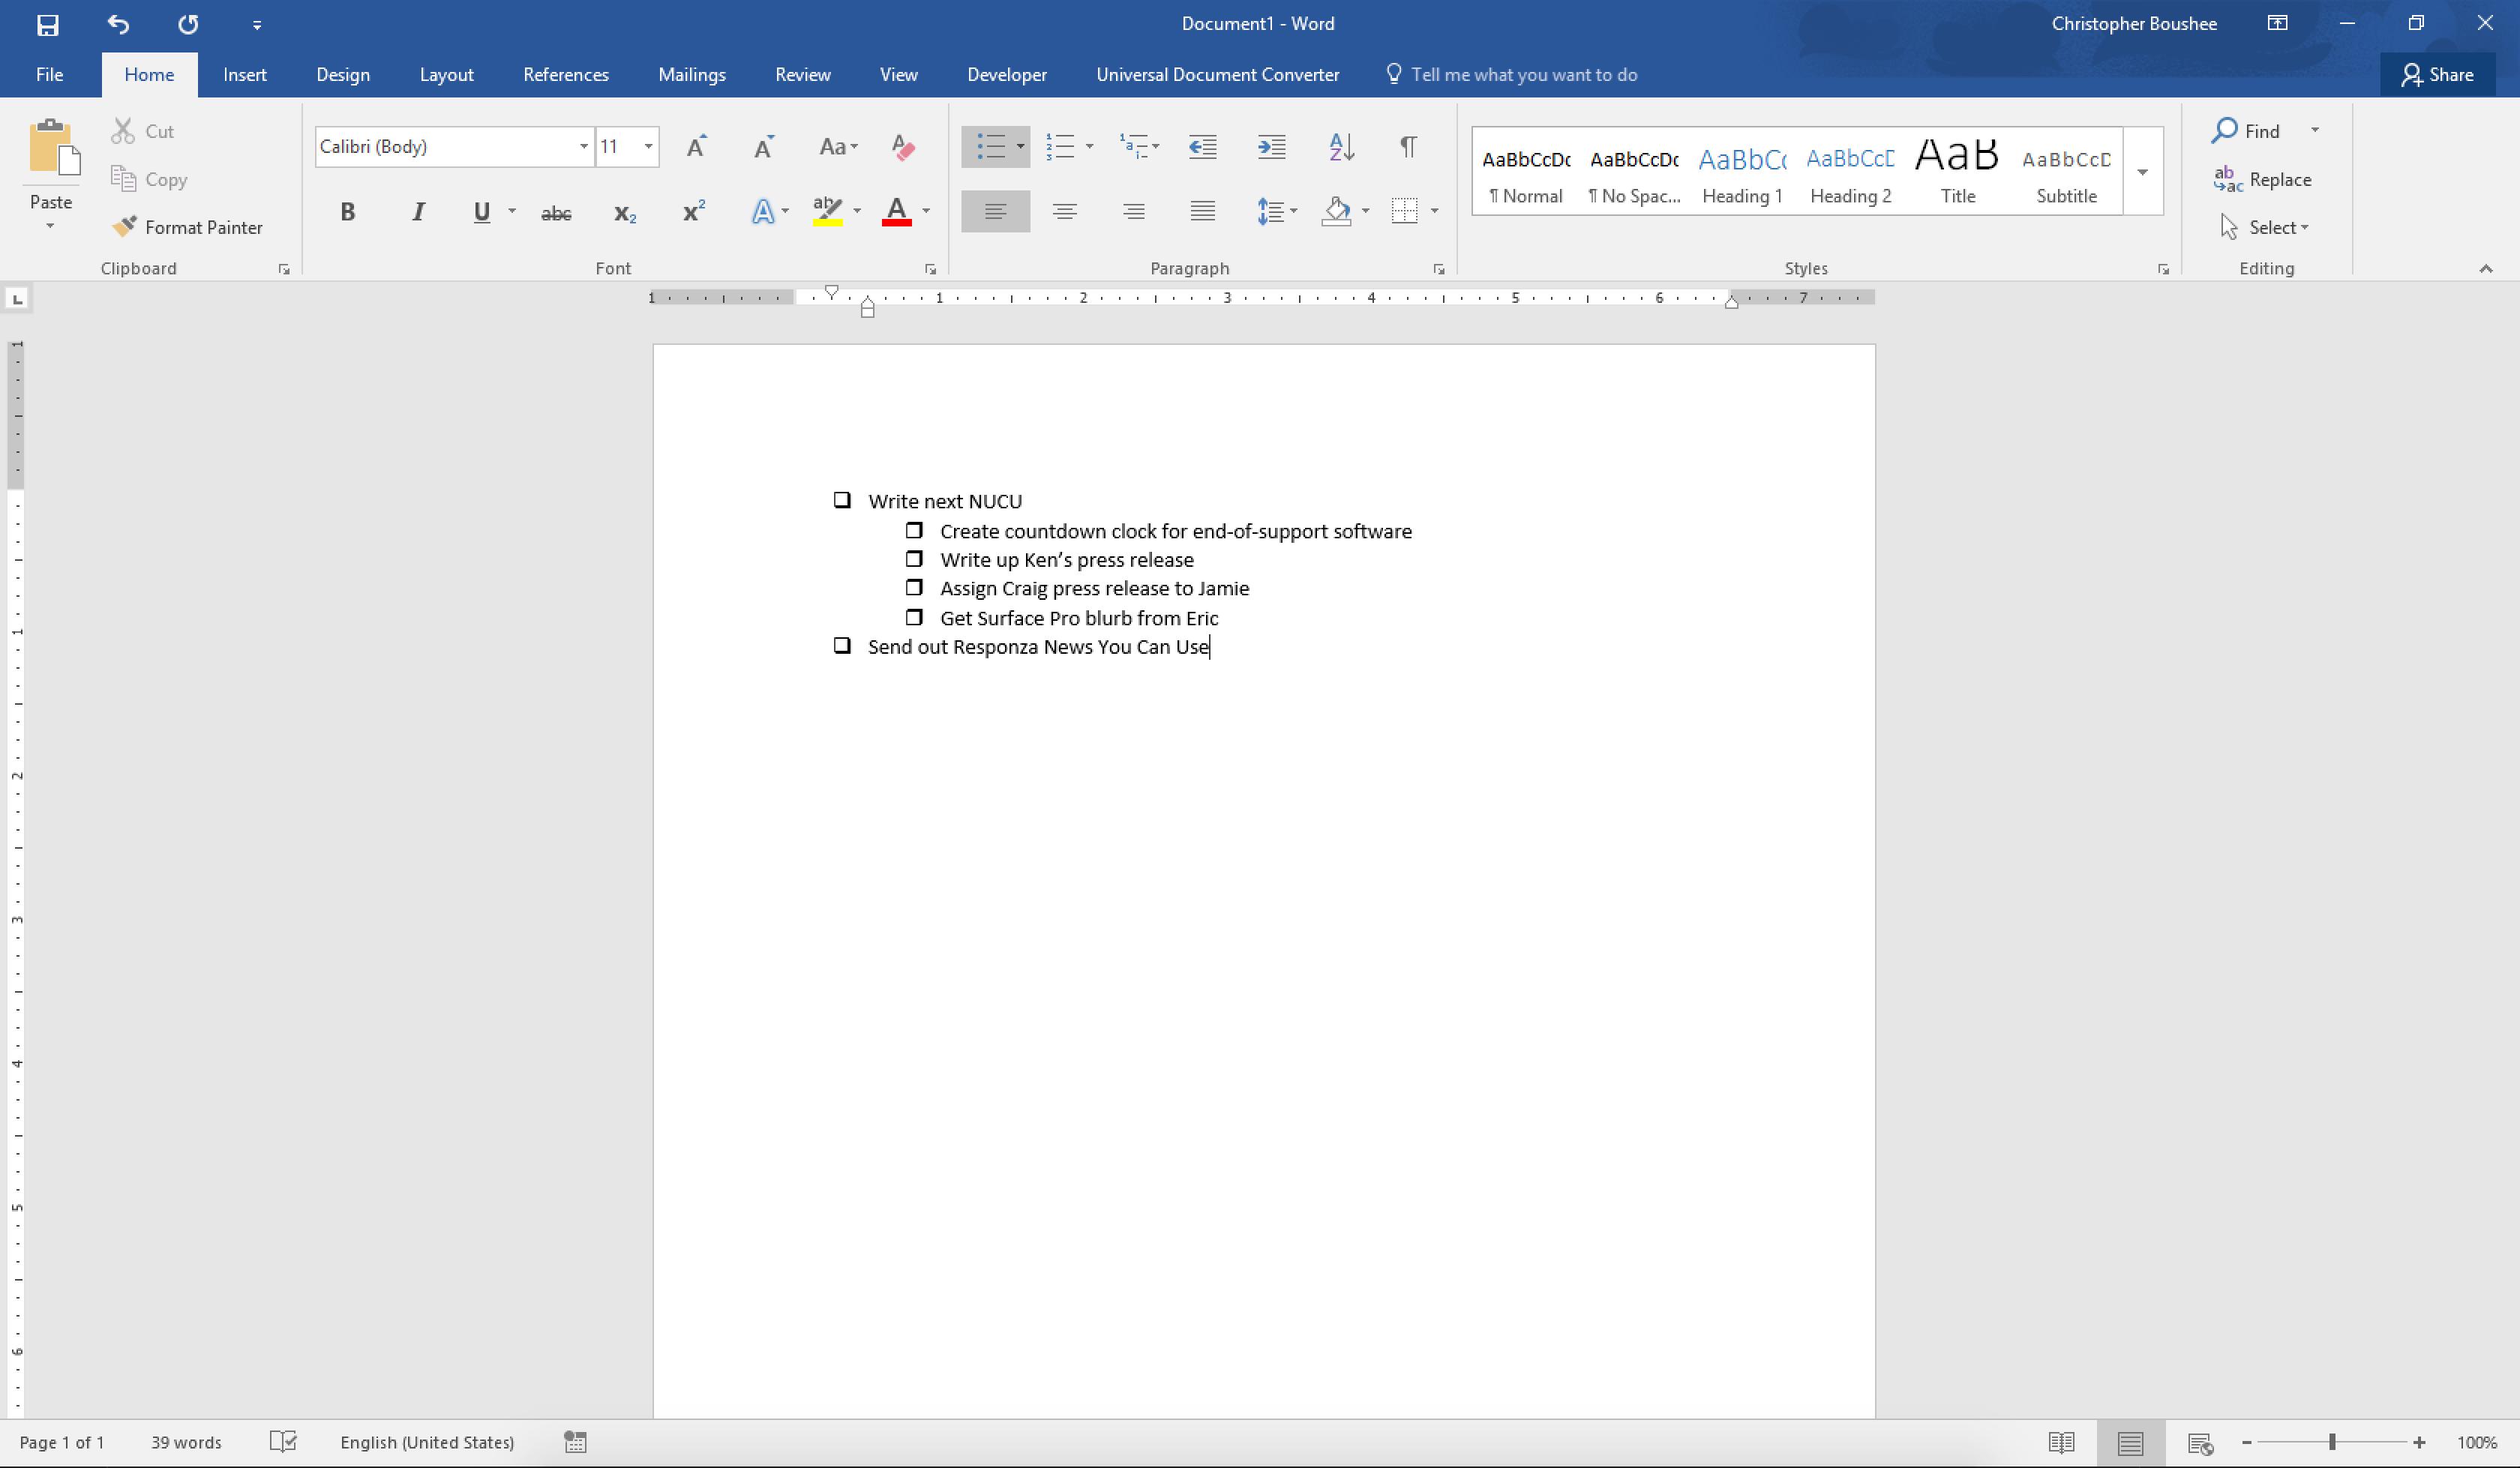 Microsoft Word Adding Symbols And Checklists To A List Responza Llc